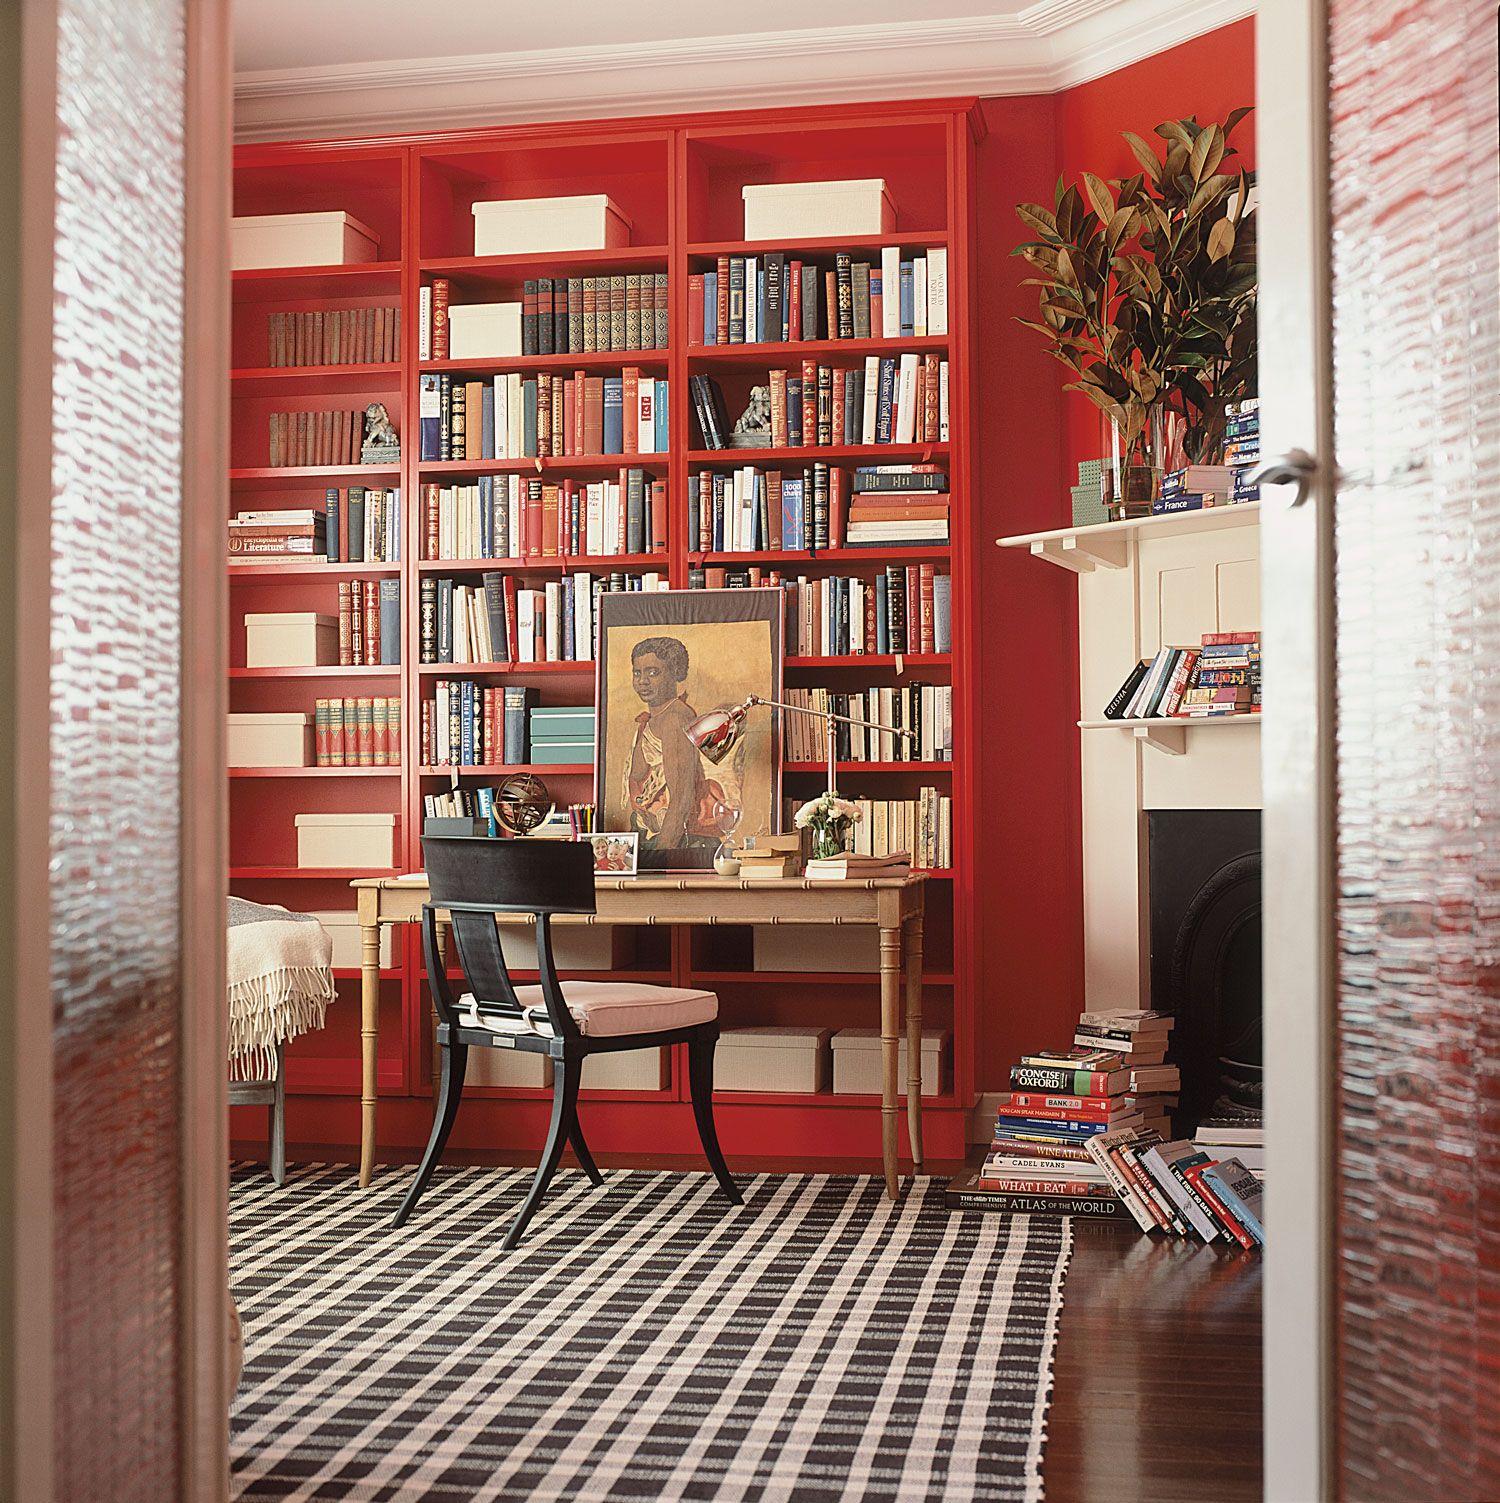 Portfolio interior design diane bergeron interiors - Find This Pin And More On Hirshfield S Design Resource Mpls Studio Images By Bethfromdr Diane Bergeron Interiors